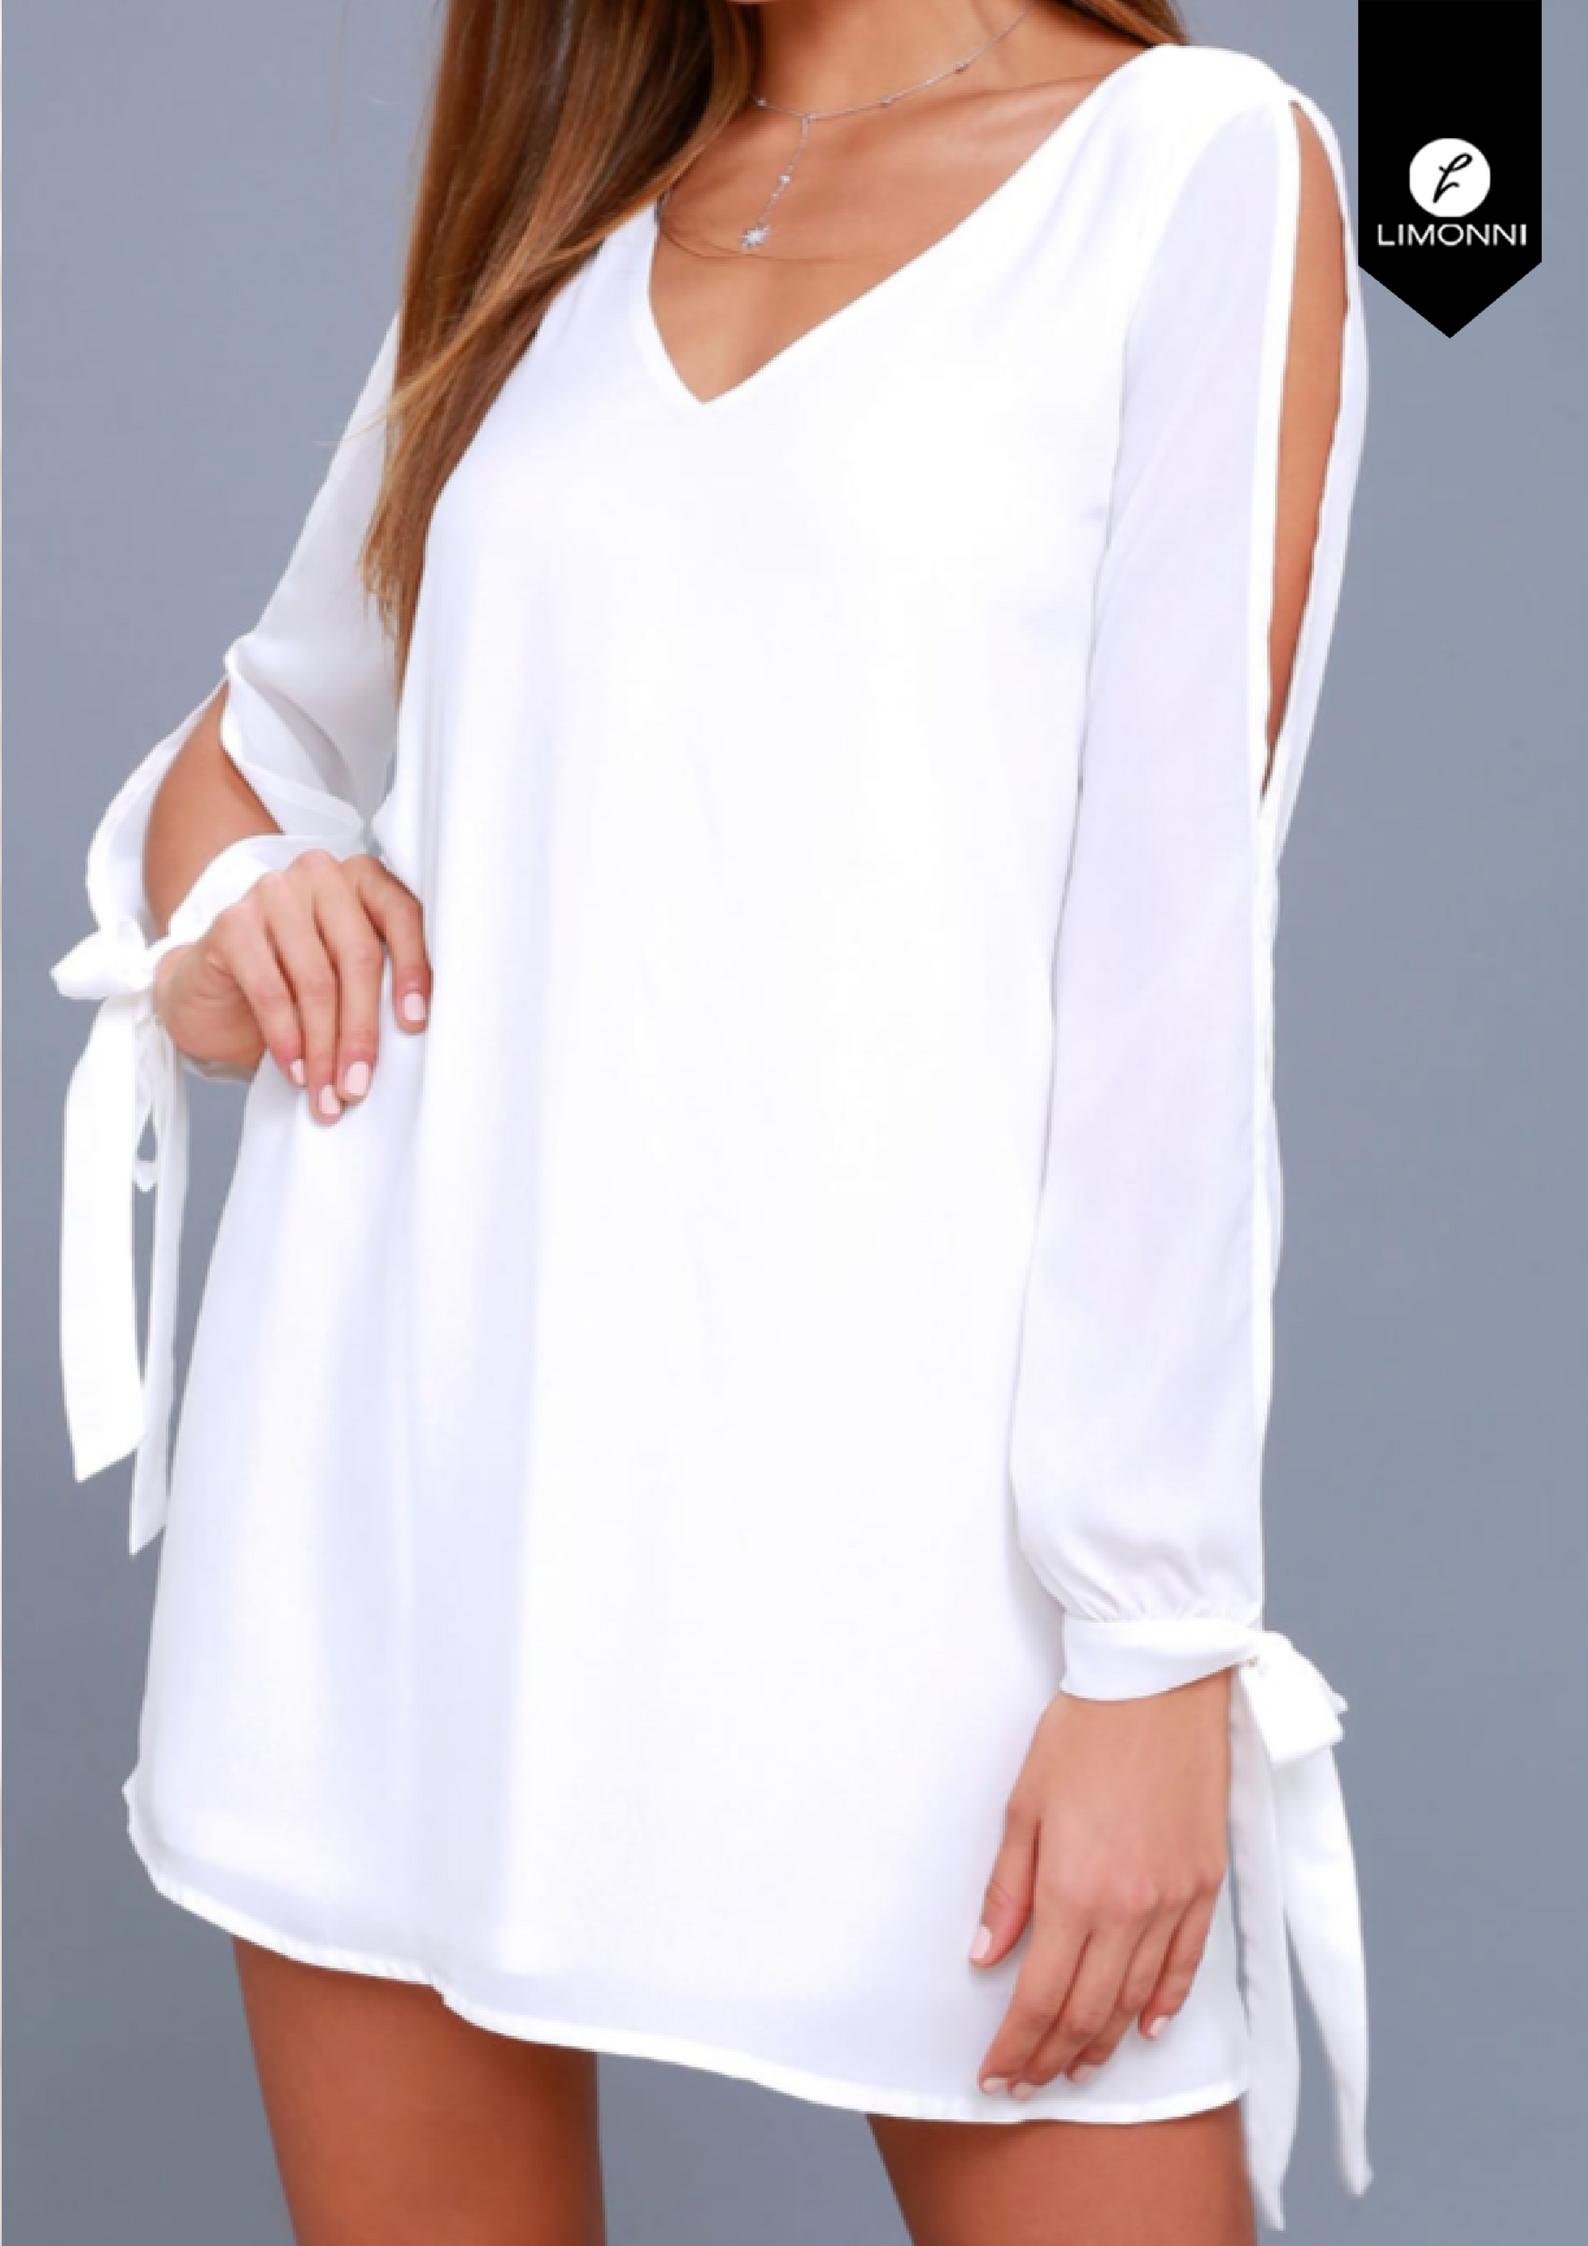 Vestidos para mujer Limonni Limonni LI1509 Cortos elegantes